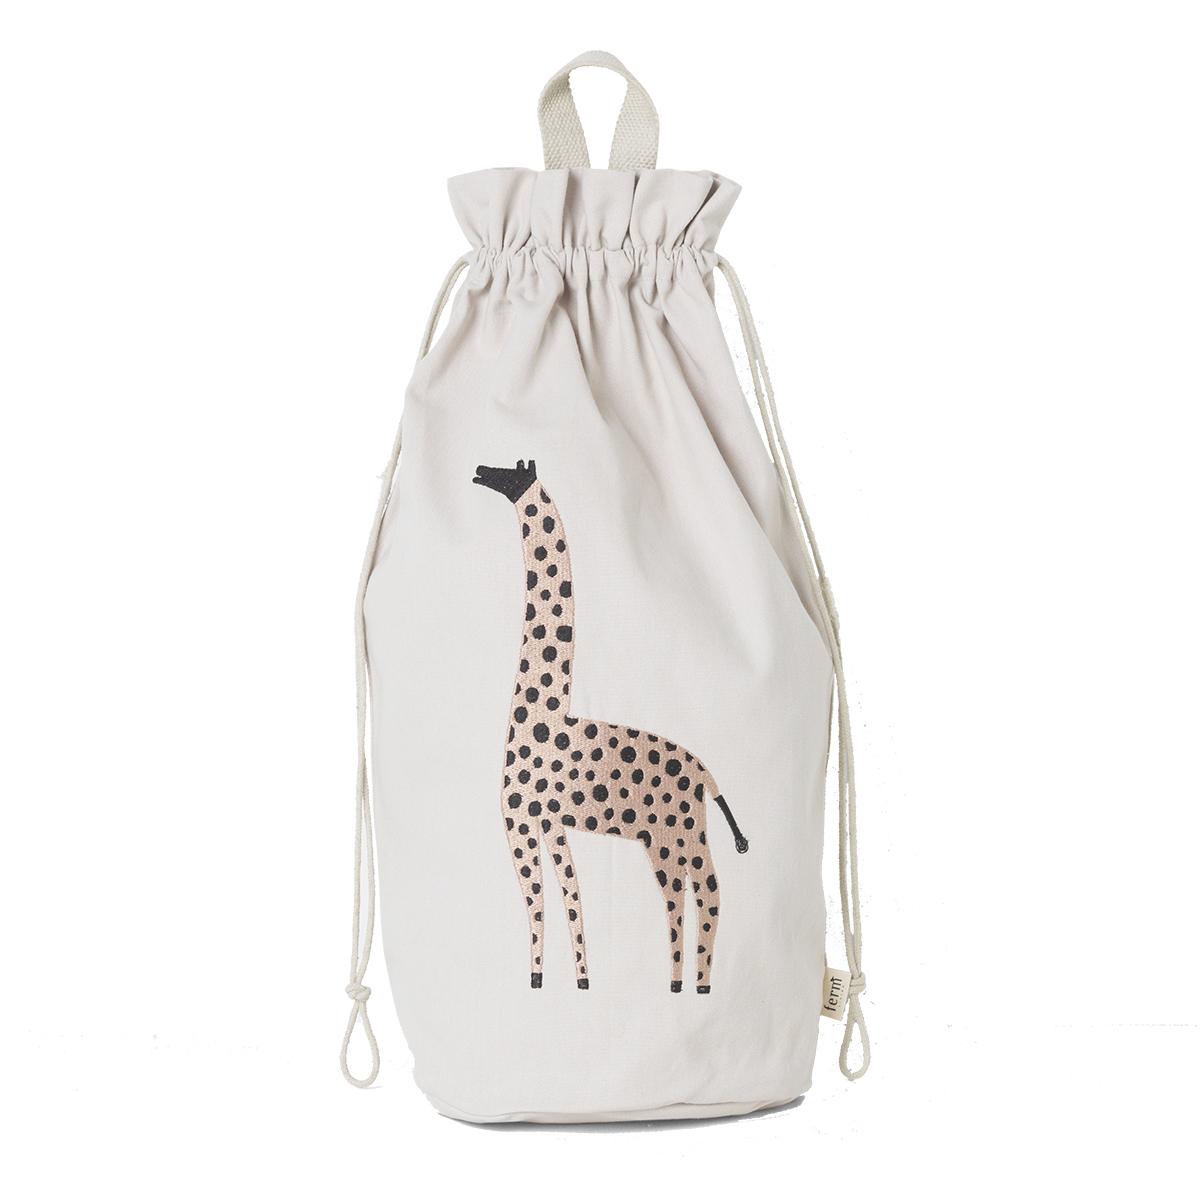 Rangement jouet Sac de Rangement Safari - Girafe Sac de Rangement Safari - Girafe